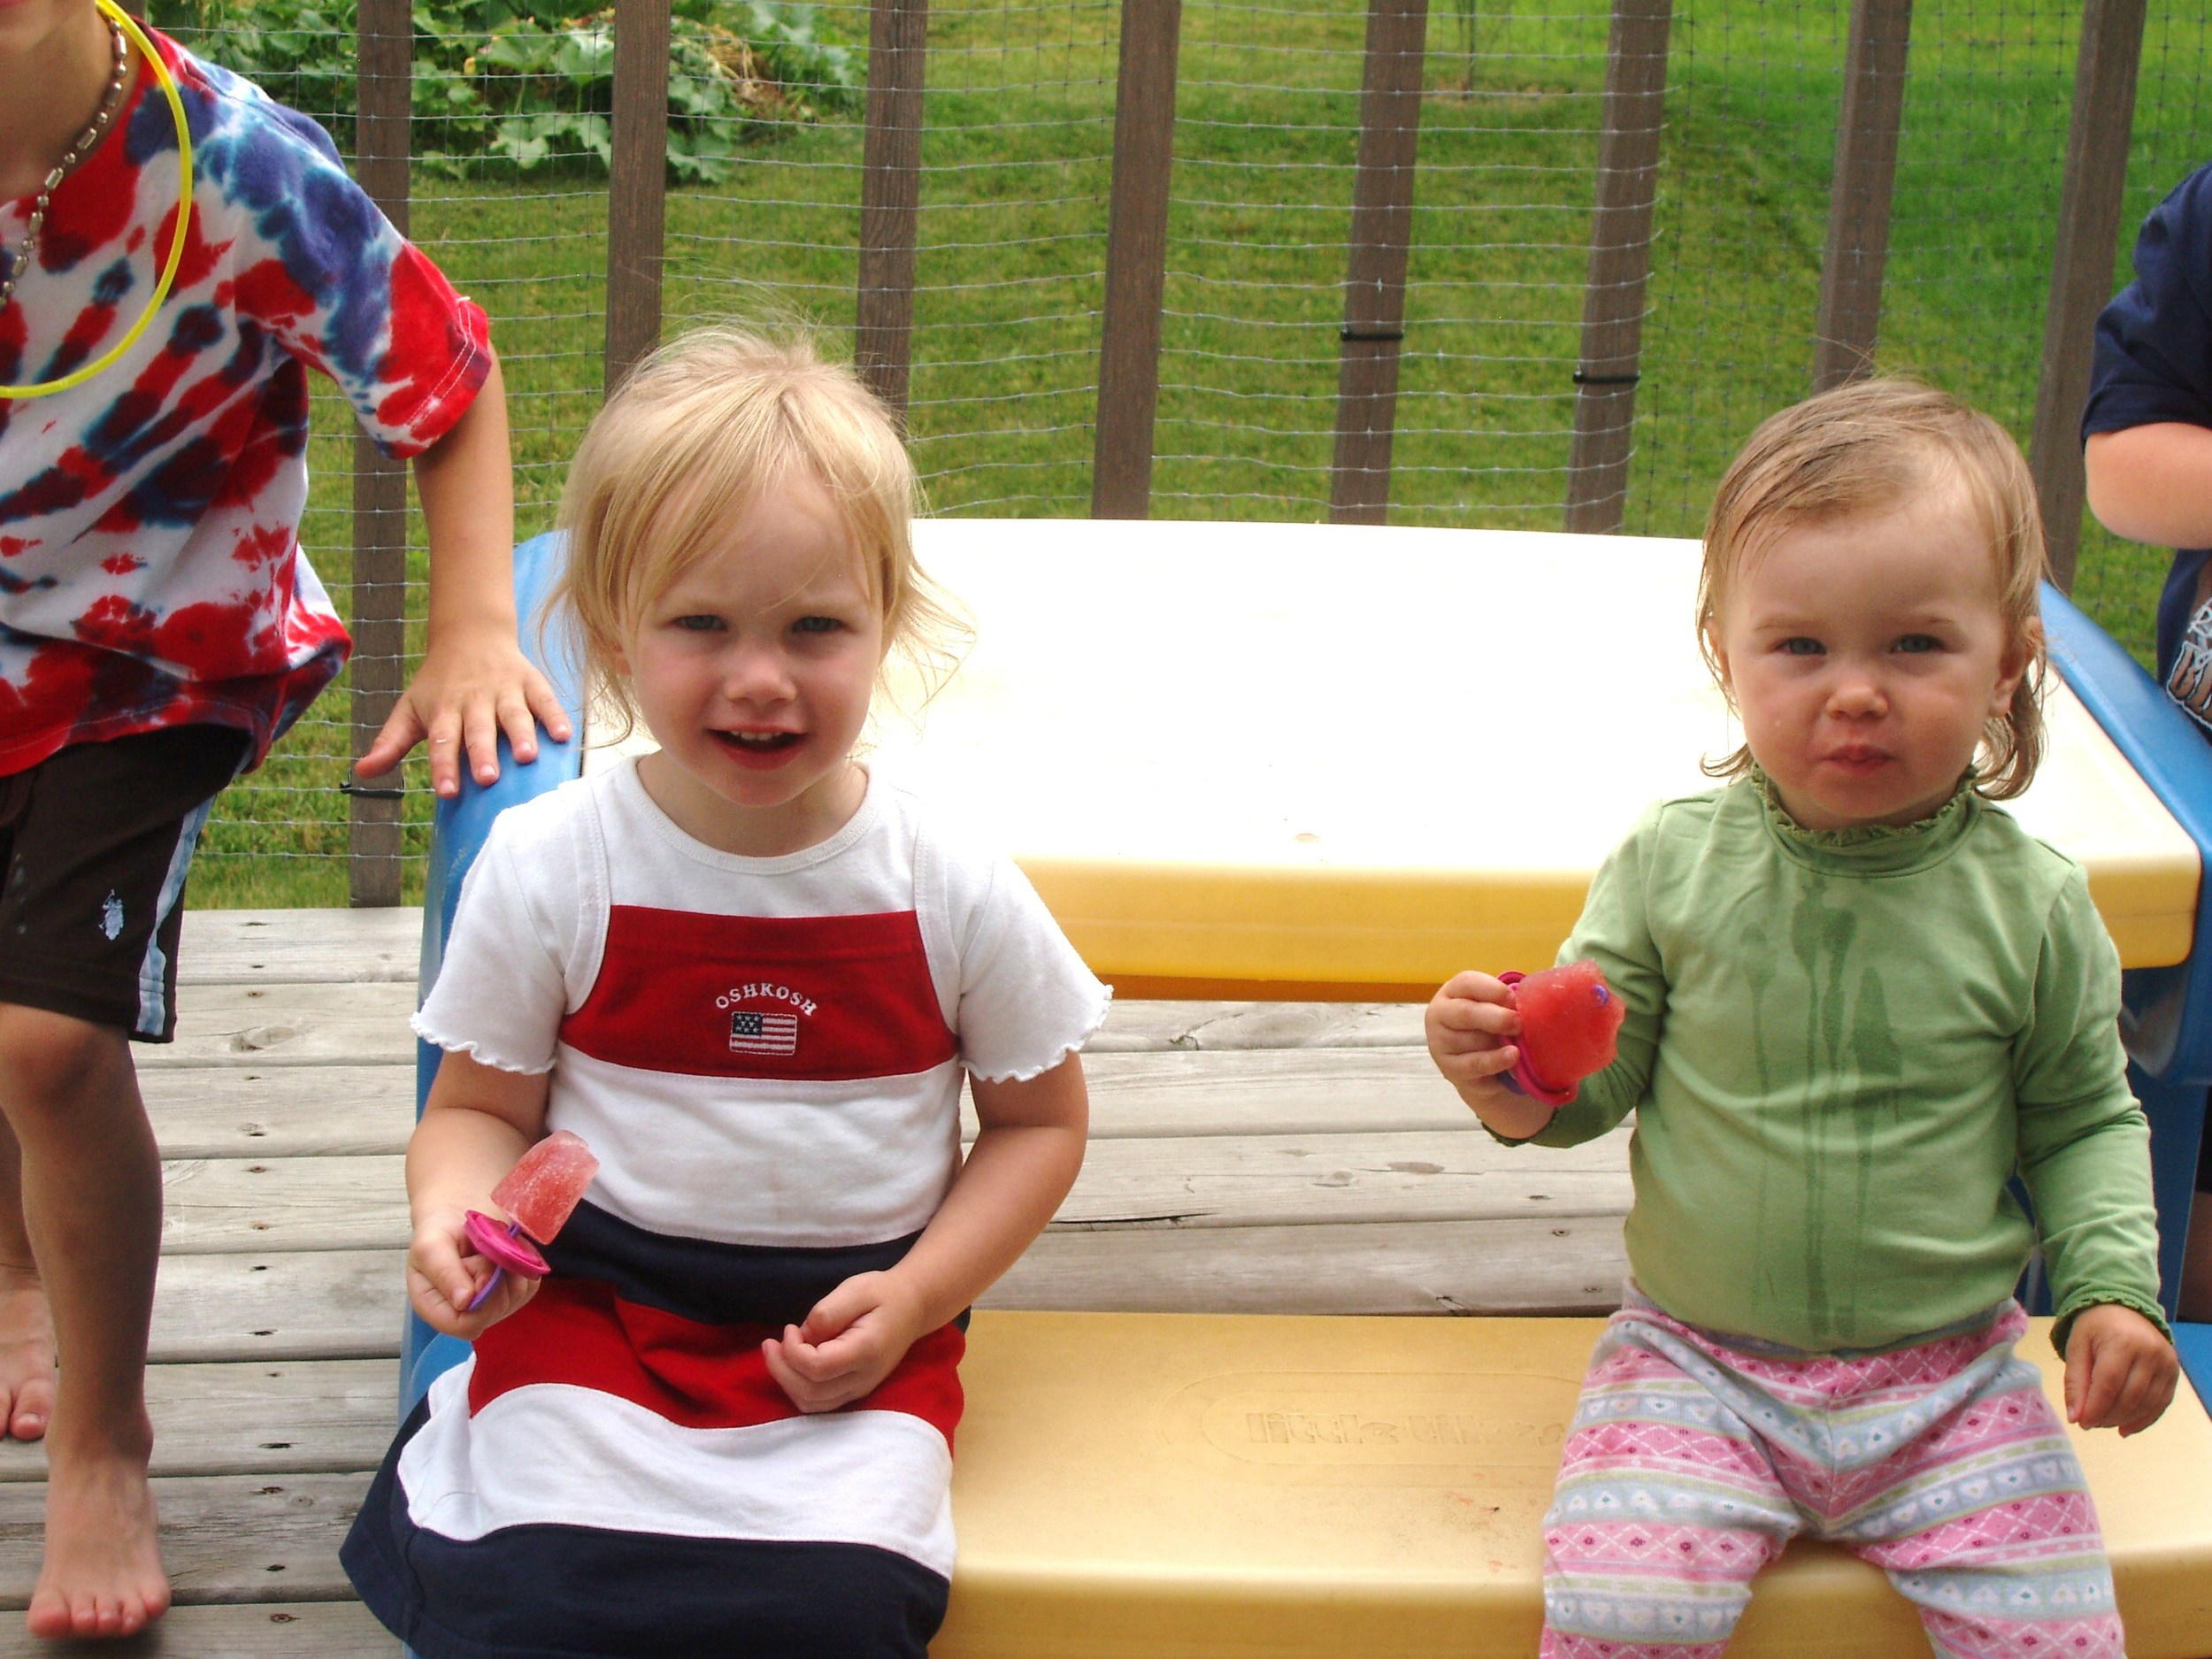 sasha & Hailey eating popsicles